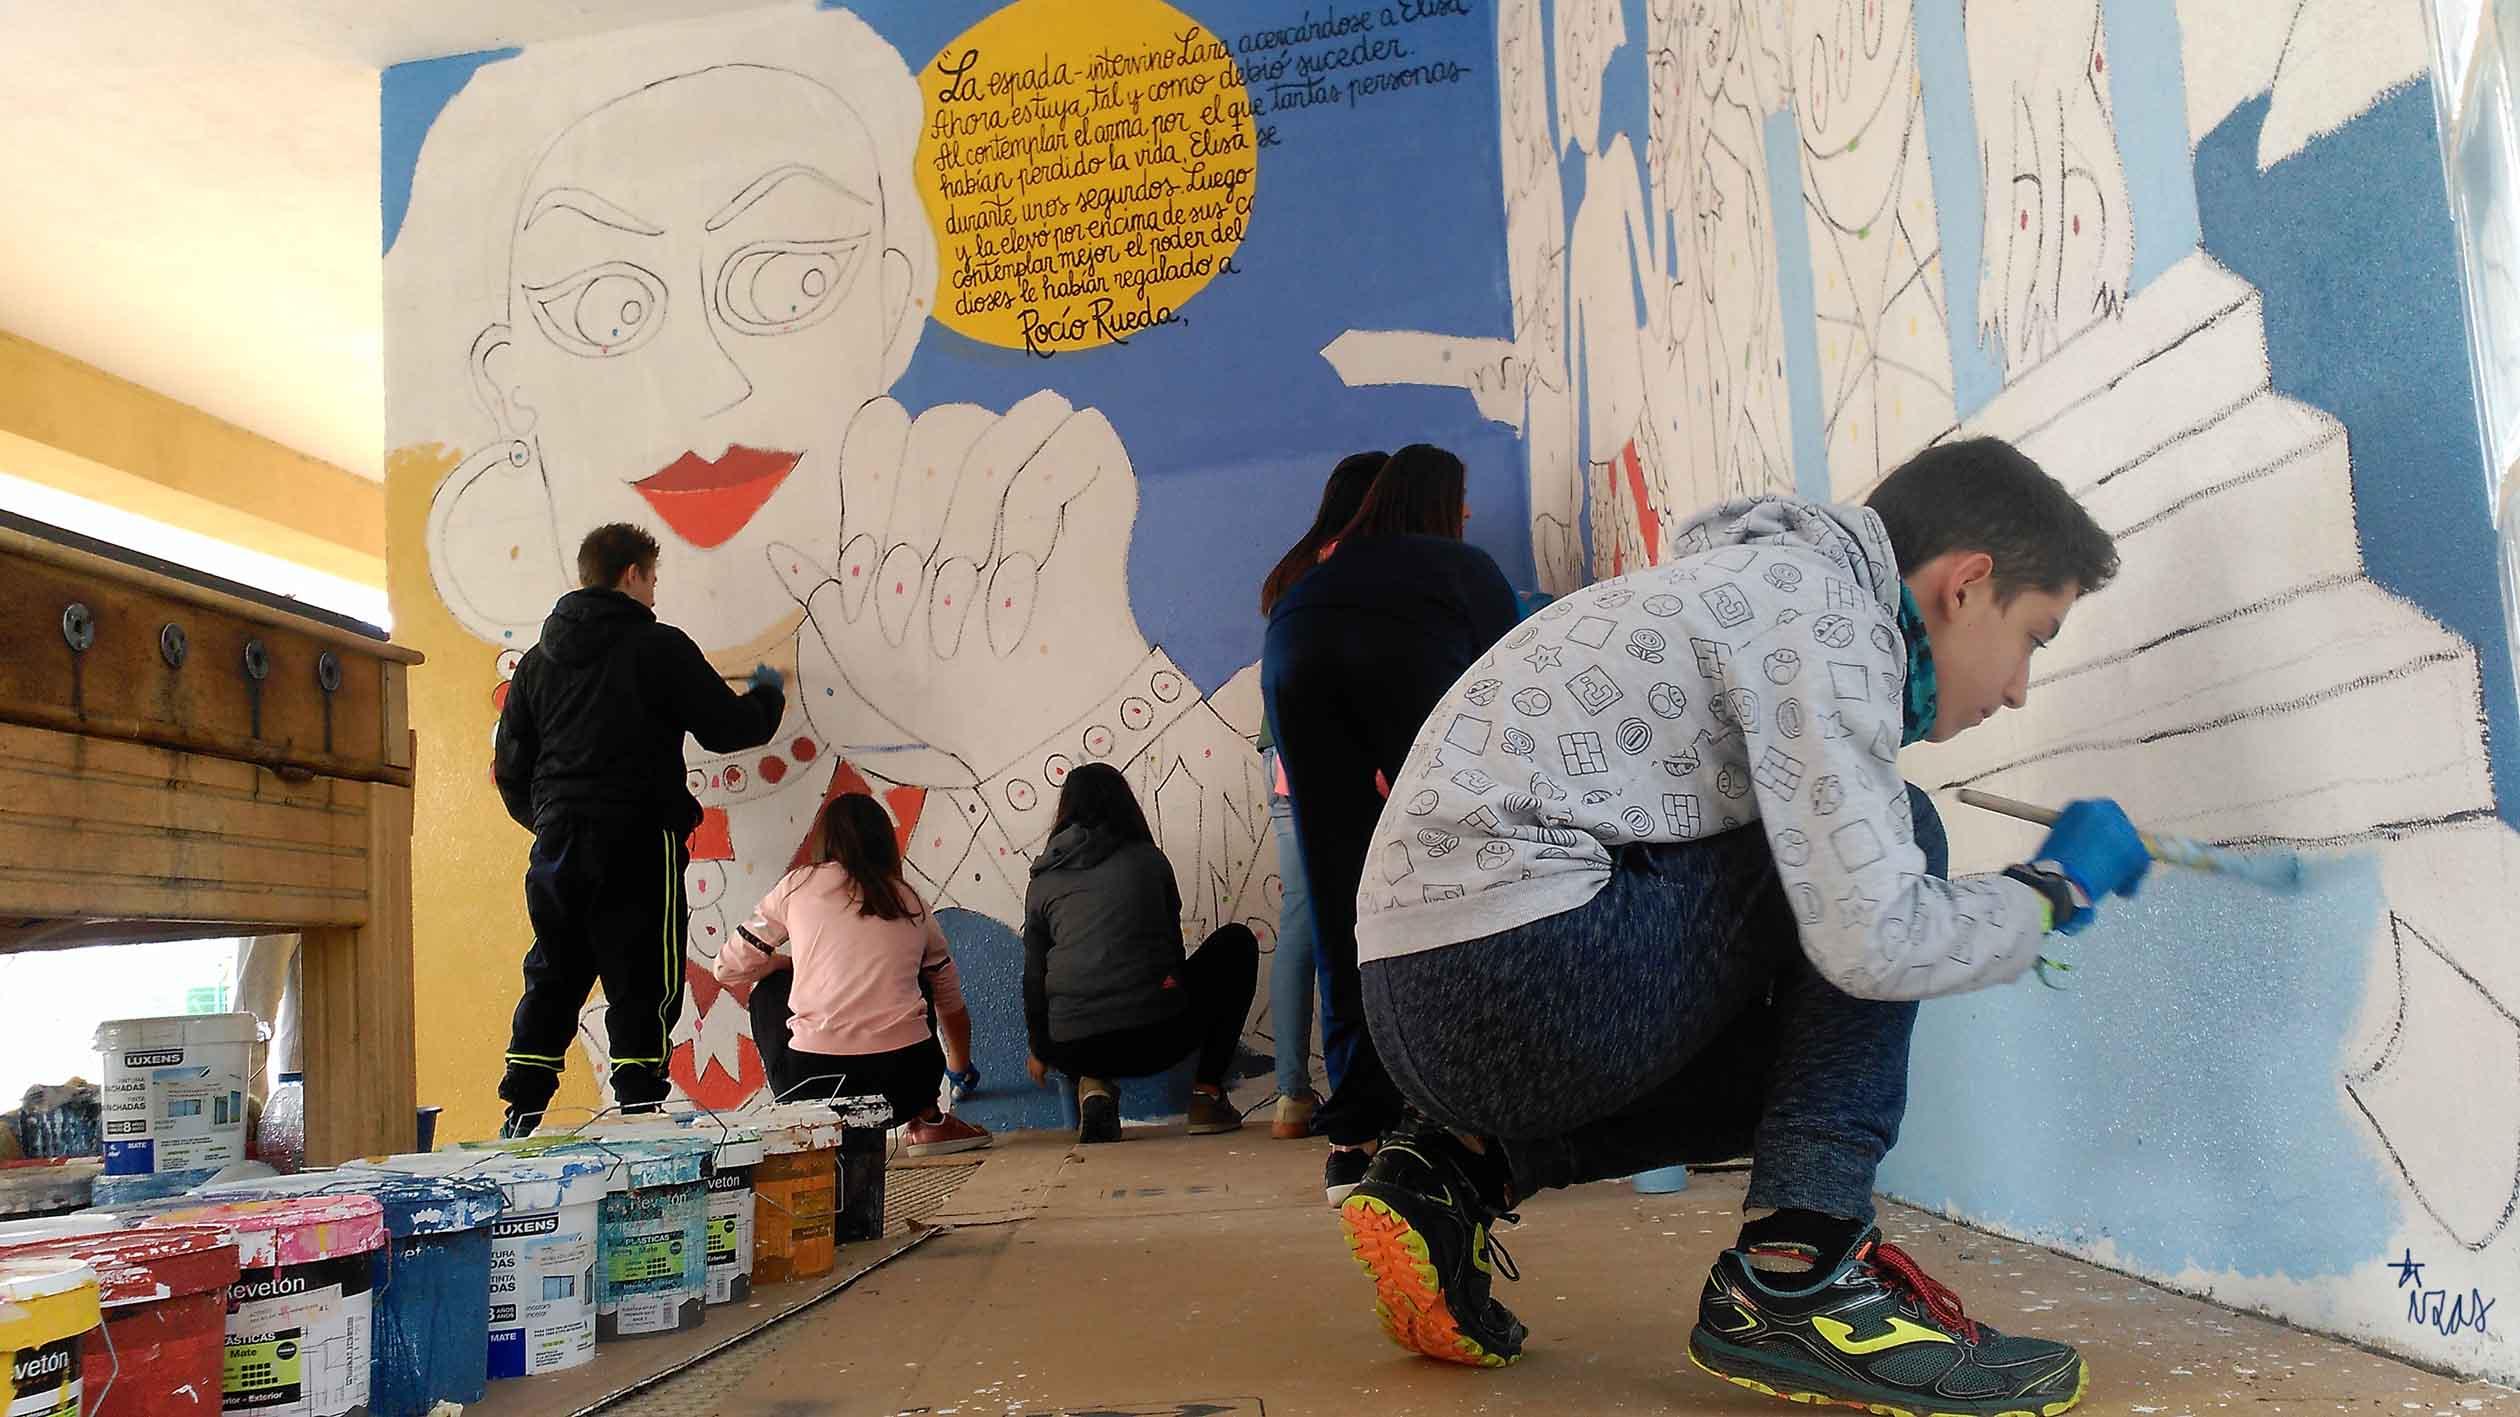 mural izas dibujando la palabra palencia 4